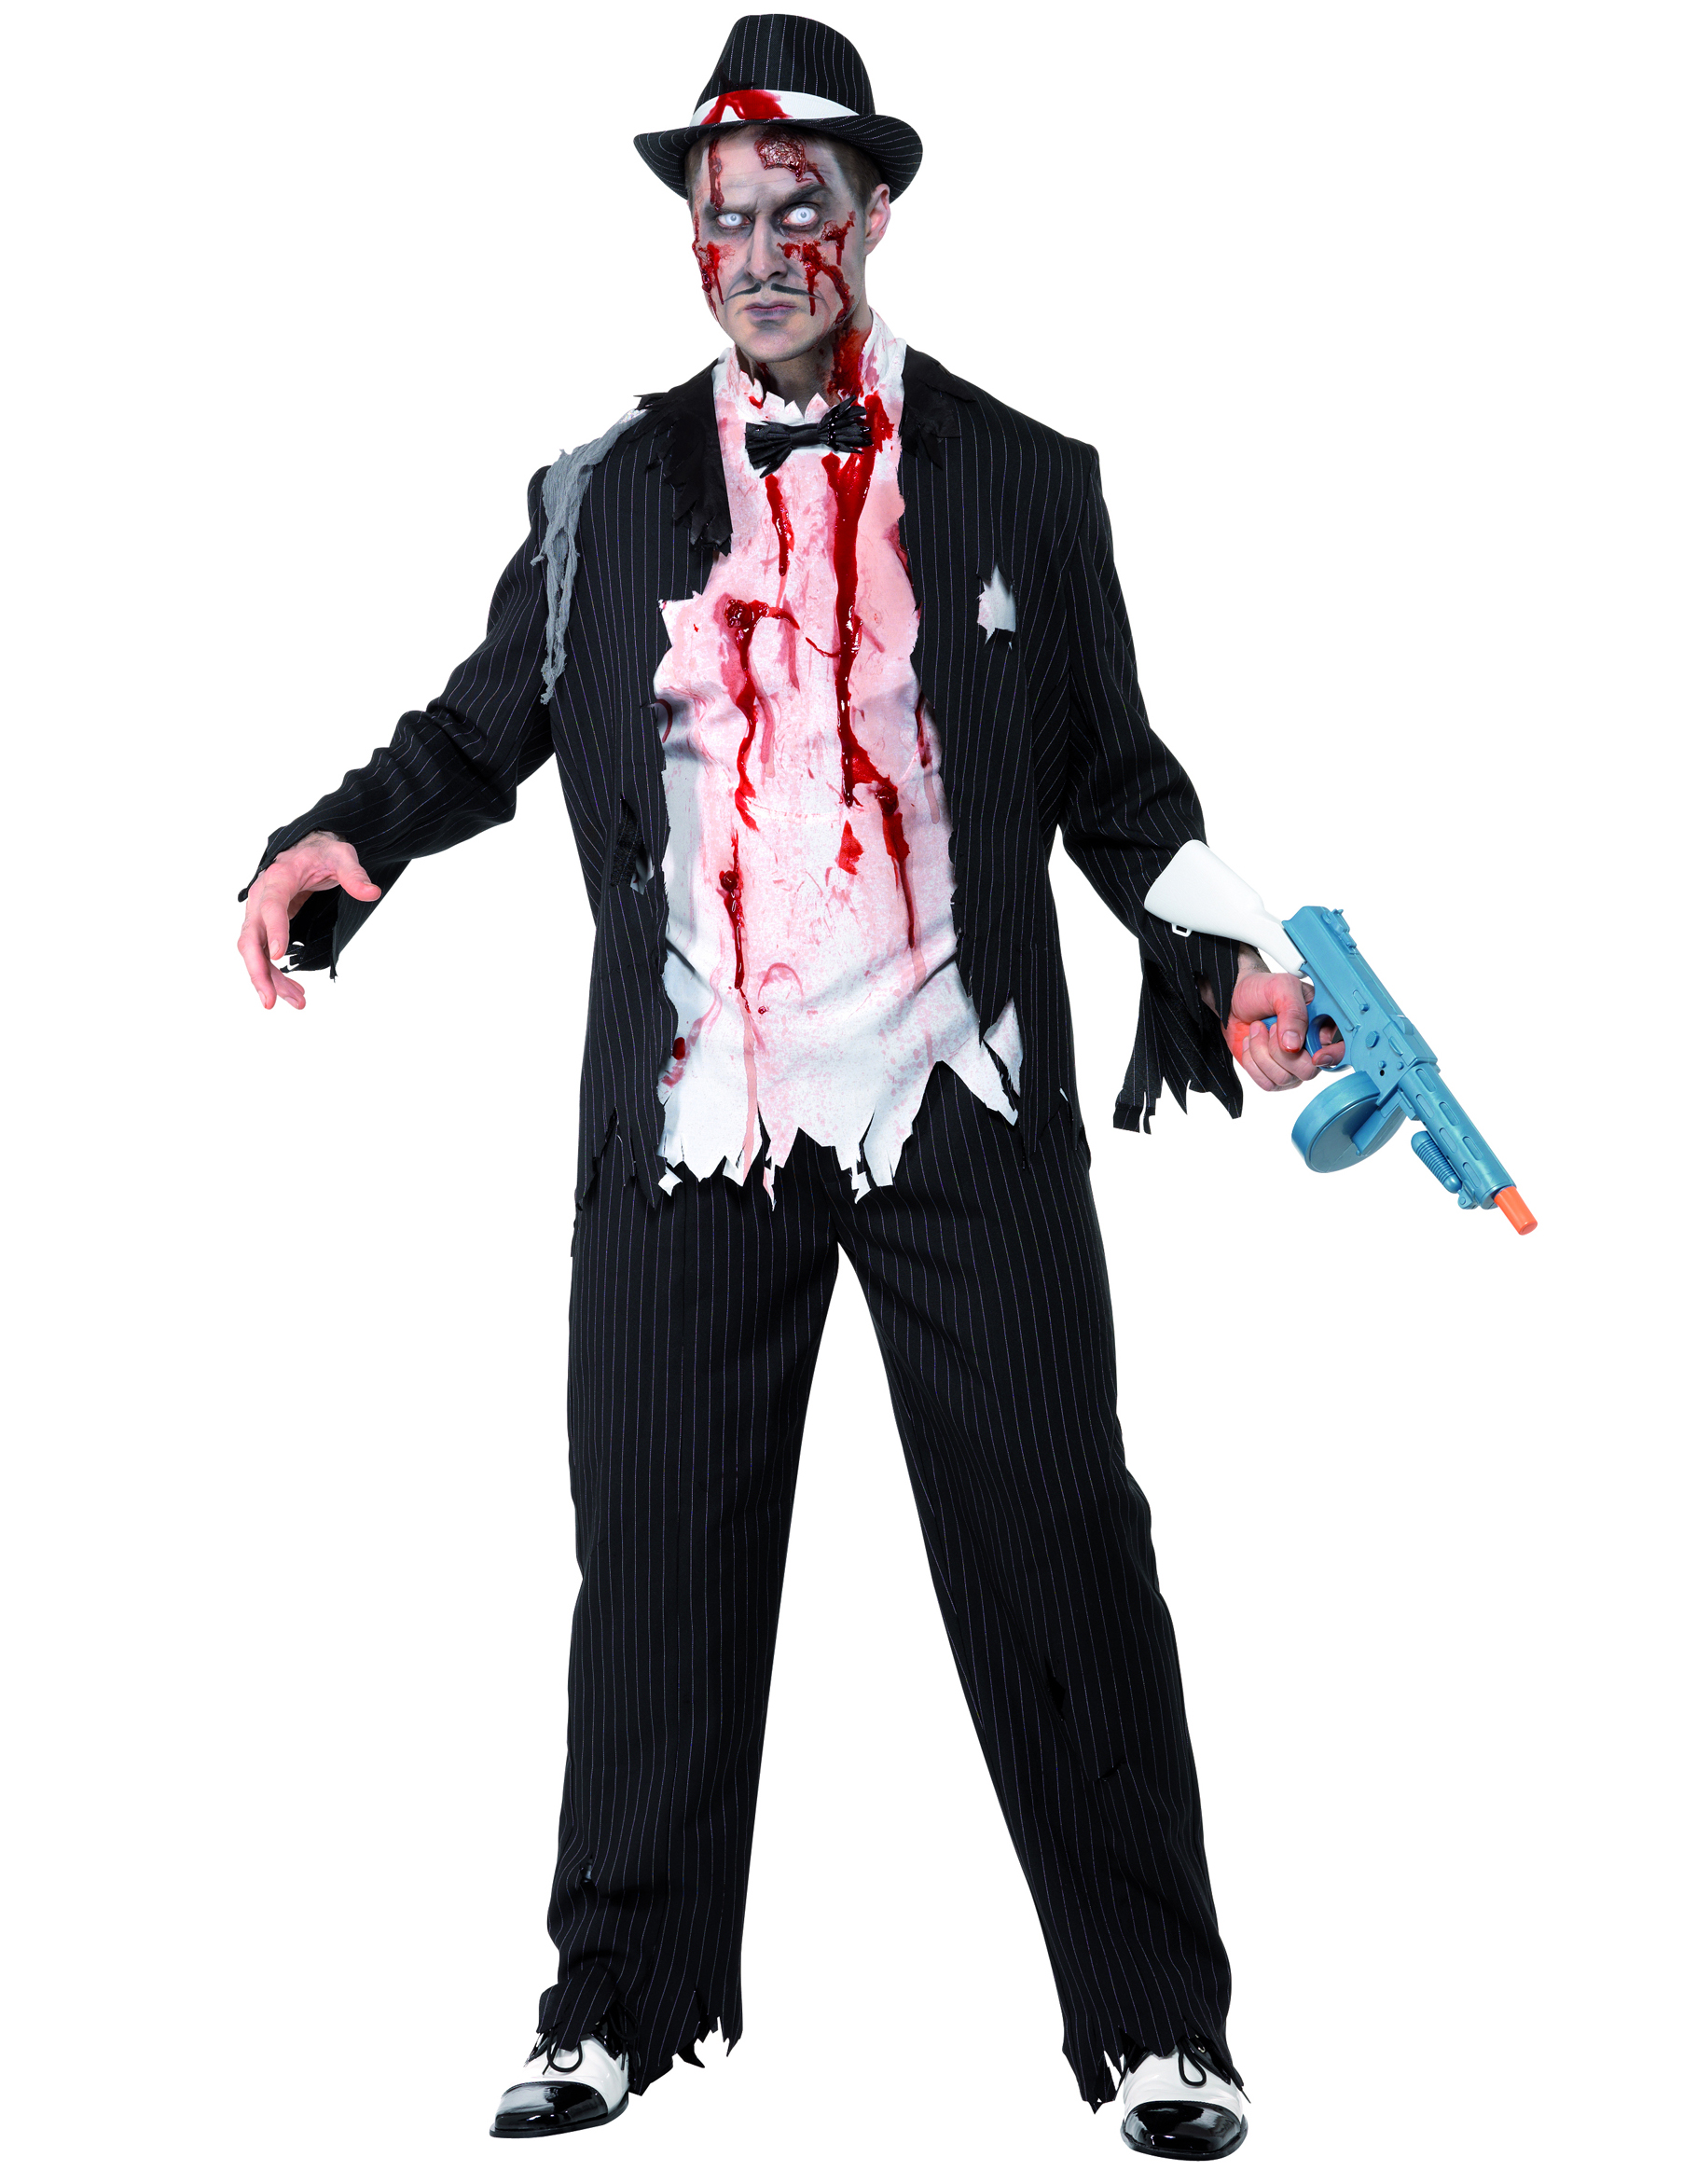 Travestimenti Halloween Uomo.Costume Gangster Charleston Zombie Uomo Halloween